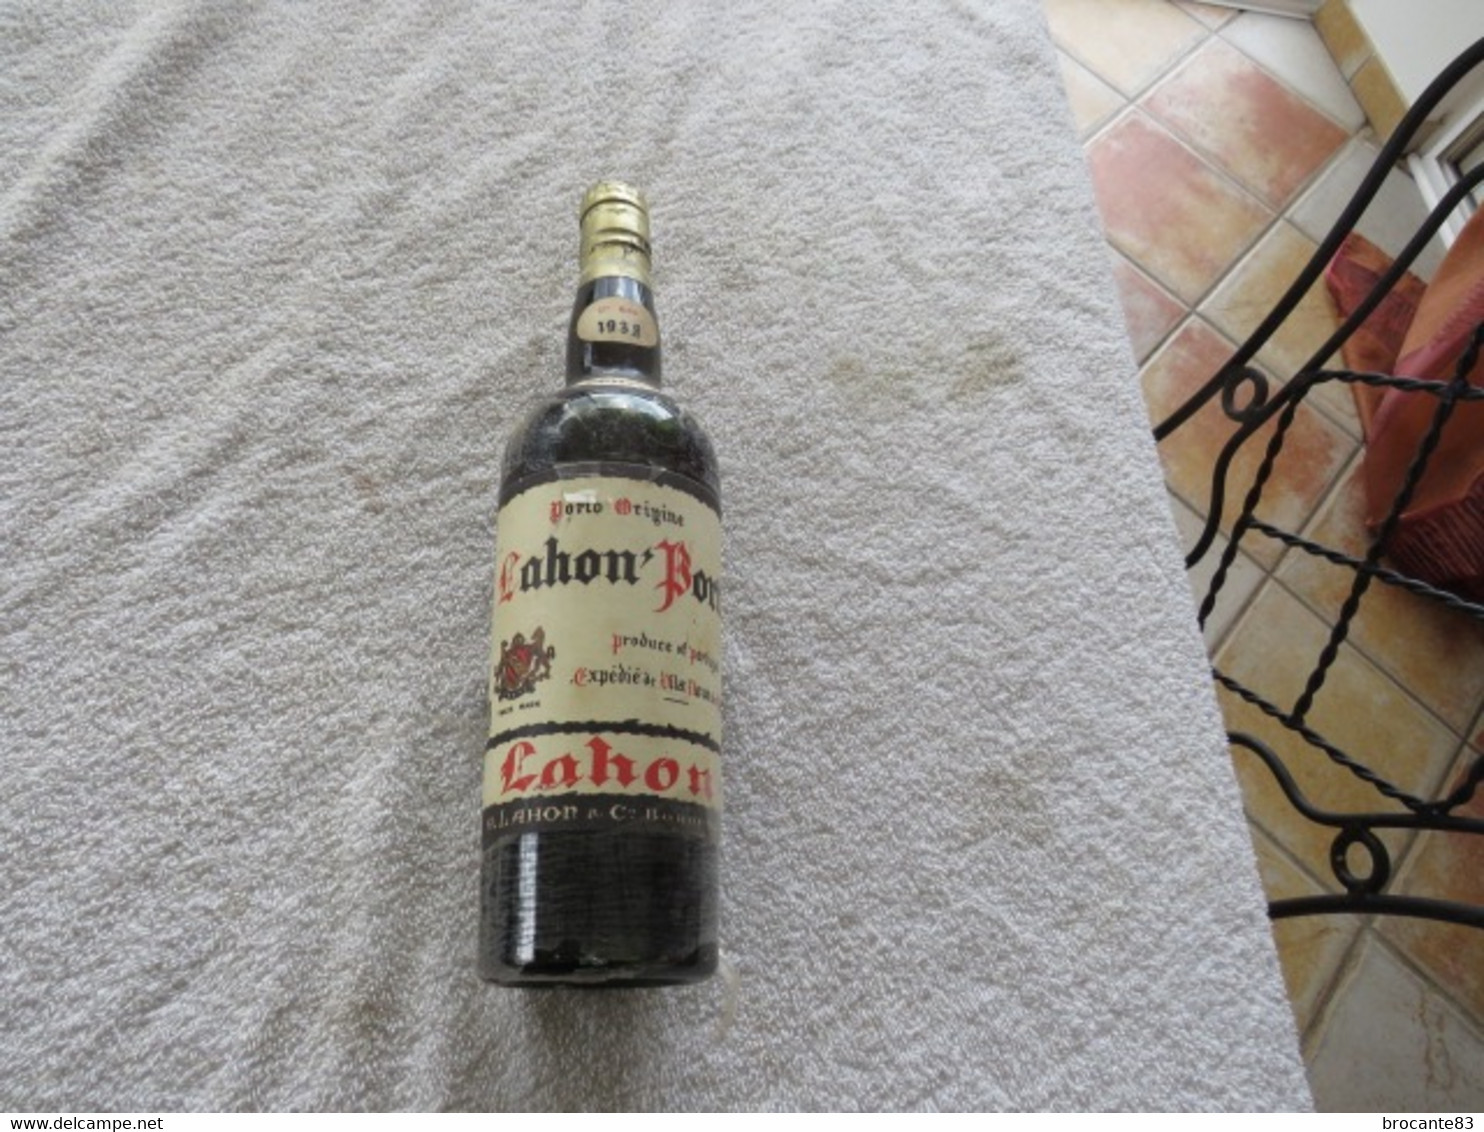 PORTO BLANC LAHON 1938 - Spirits